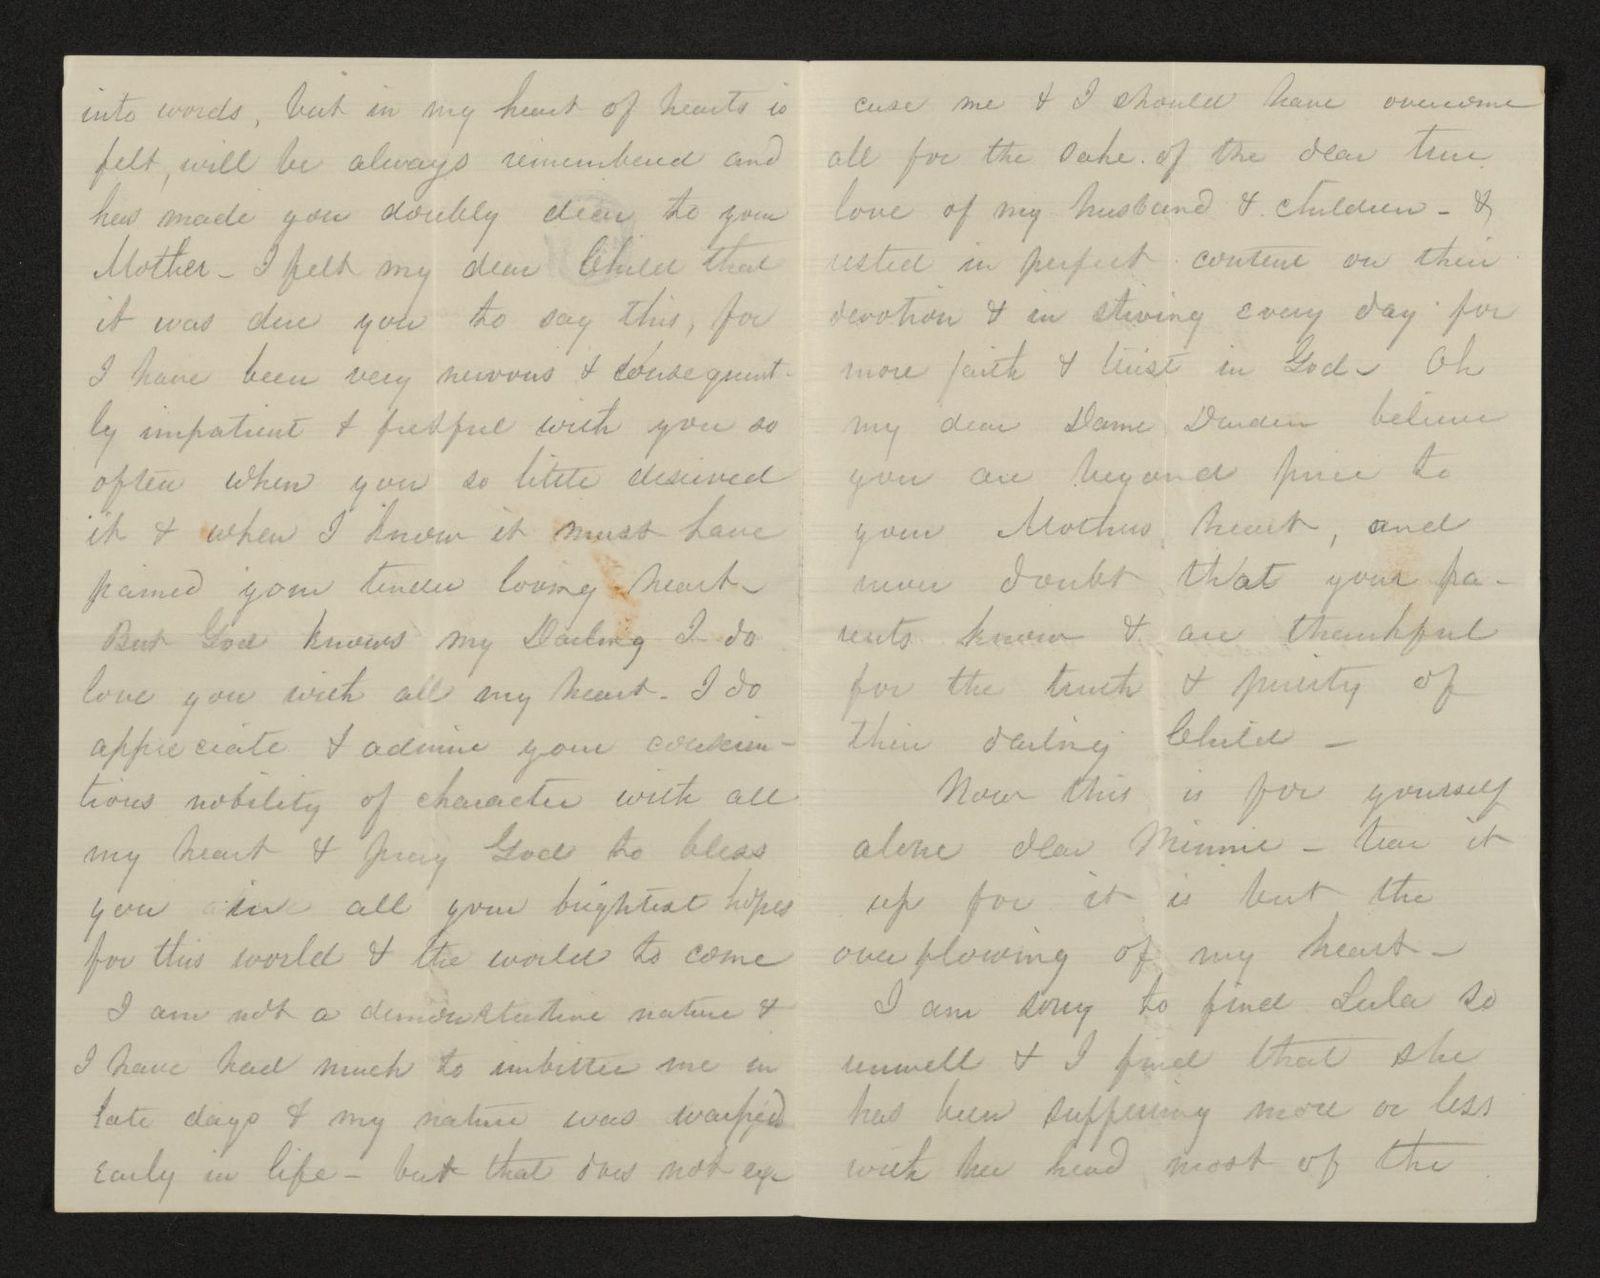 Lewis H. Machen Family Papers: Gresham Family Correspondence, 1834-1925; 1872